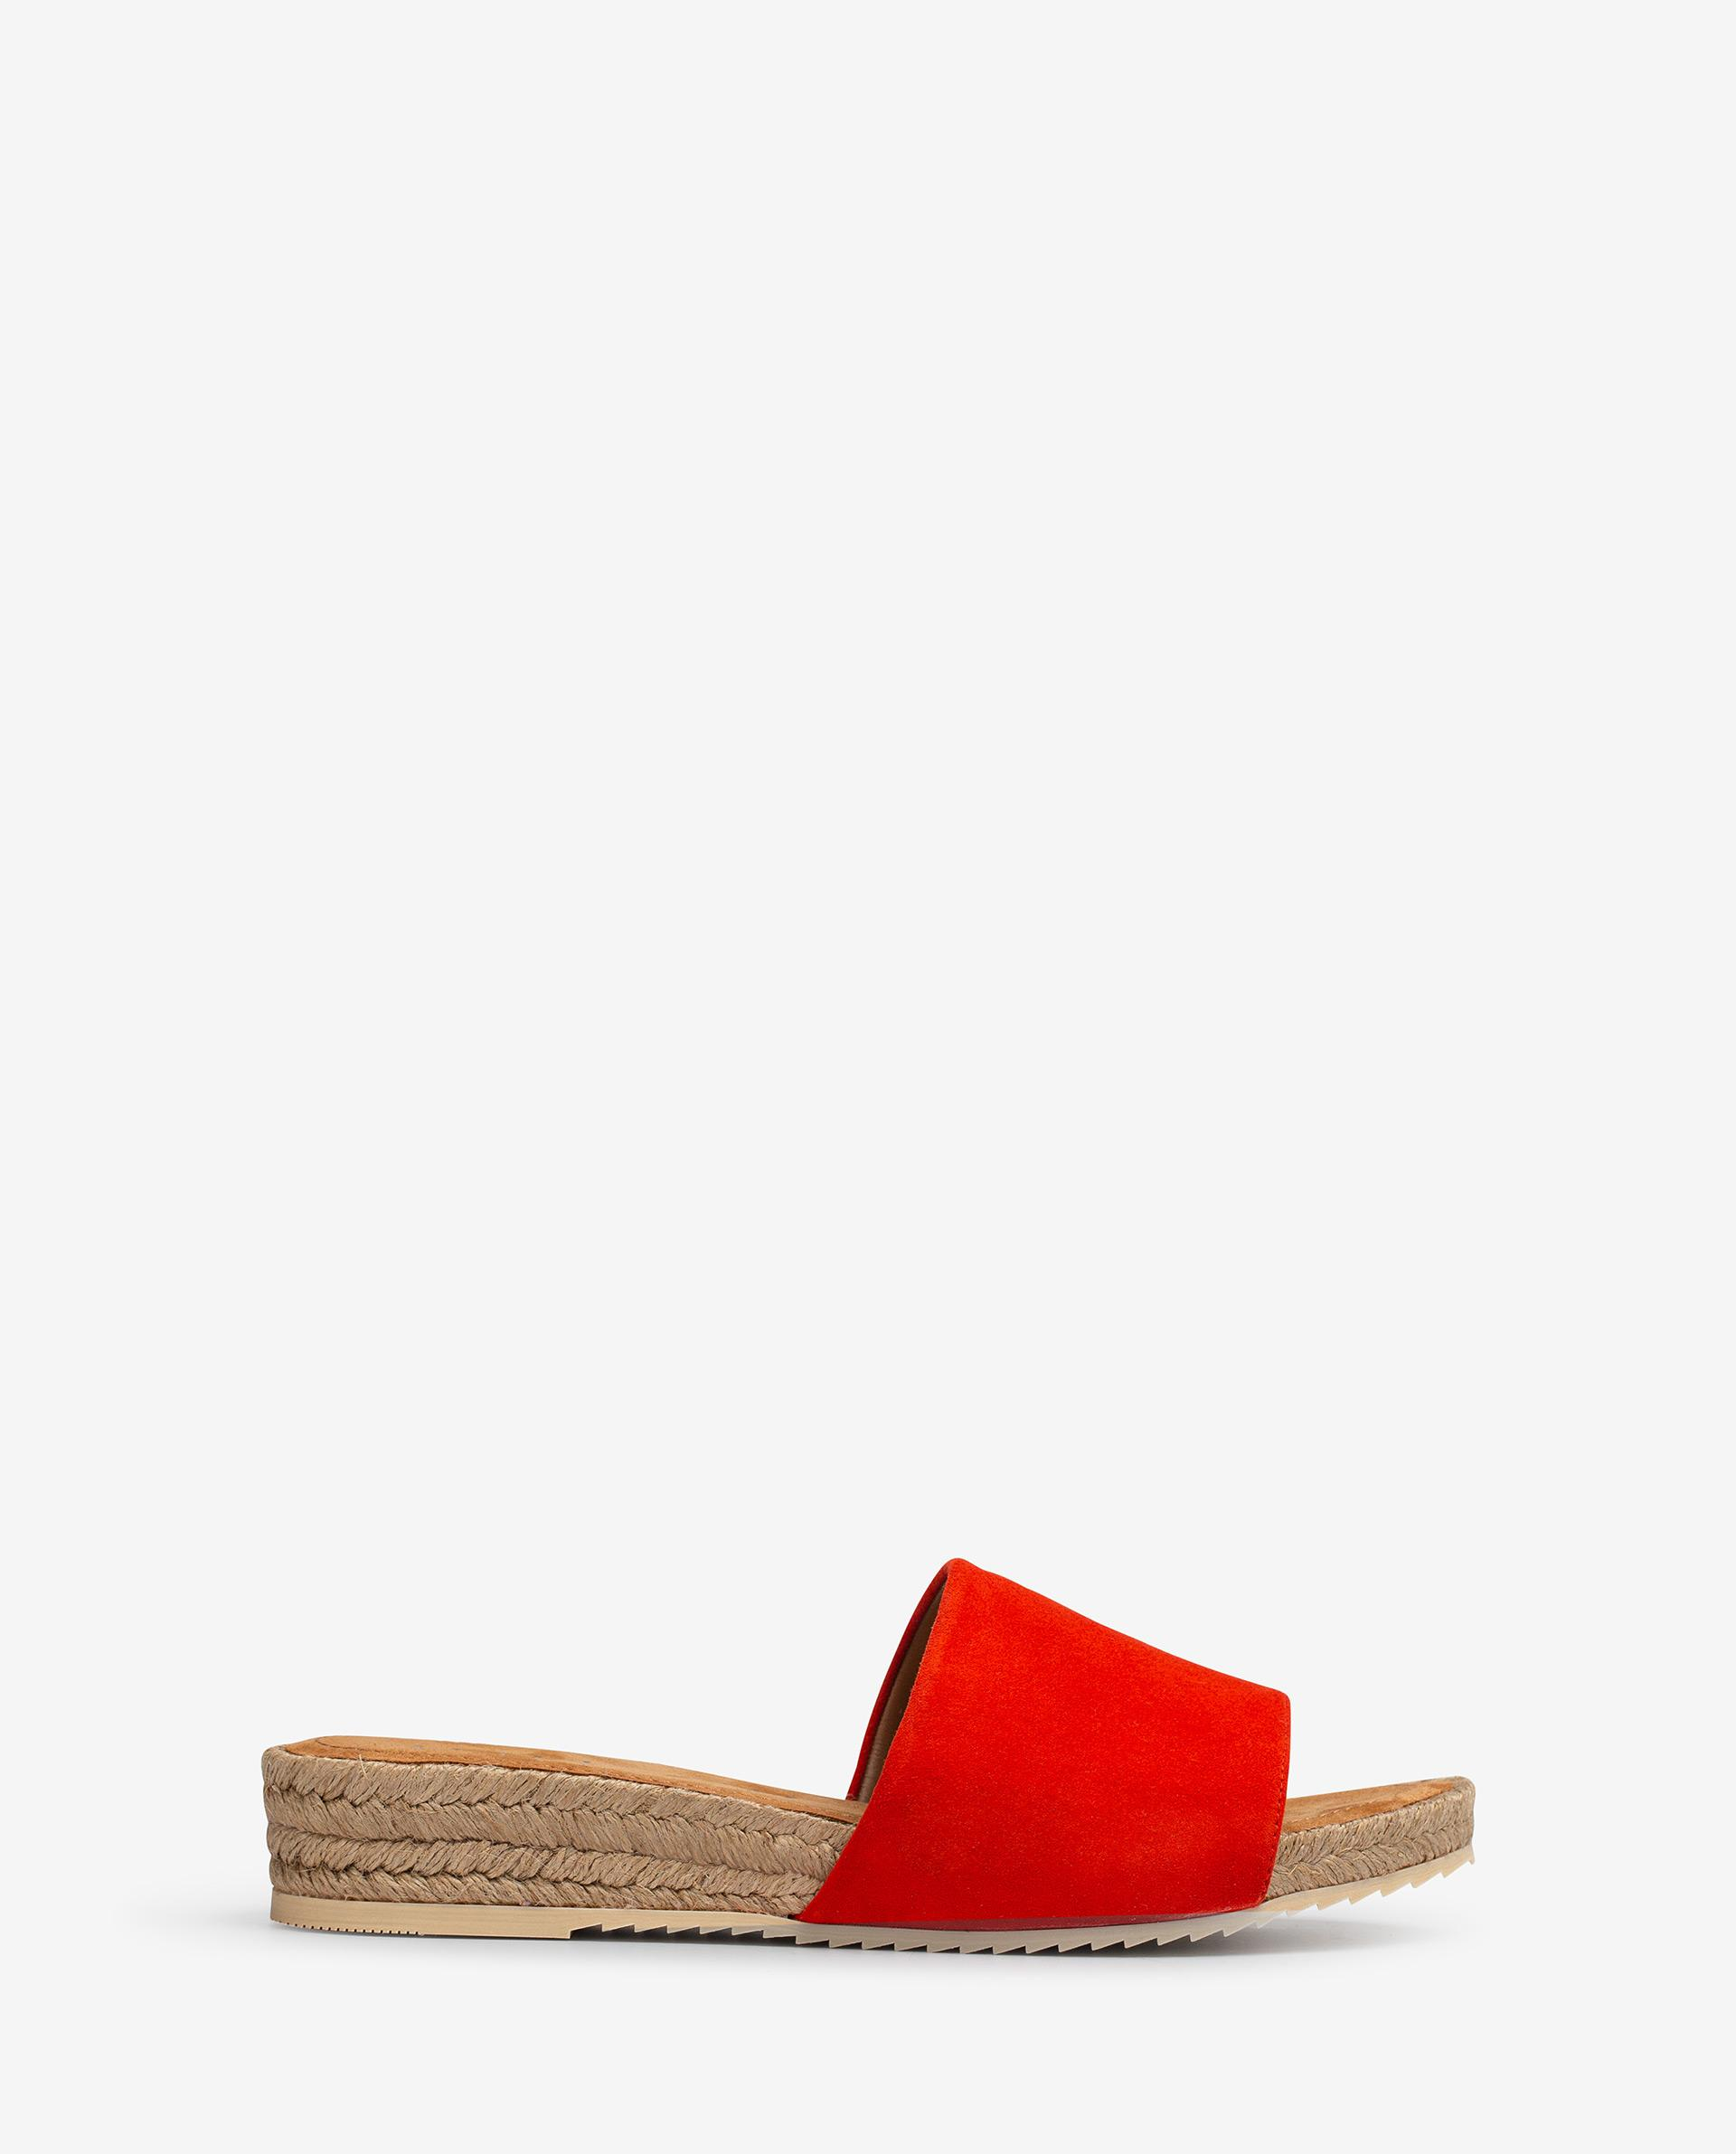 Unisa Zapatos de Mujer BATZANSIN_KS corallo 5